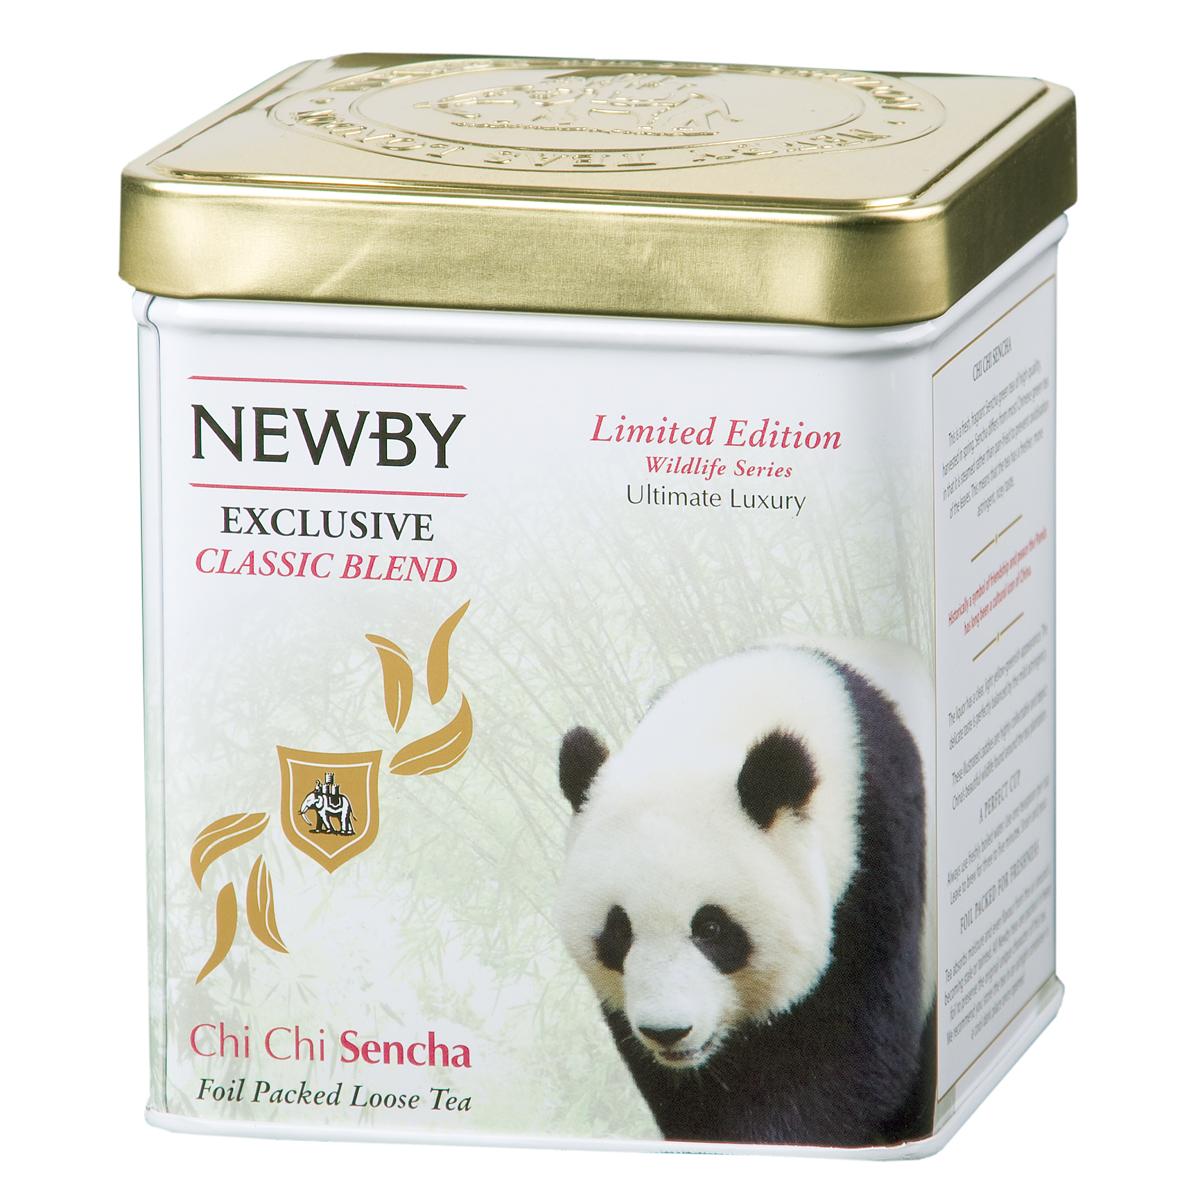 Newby Chi Chi Sencha зеленый листовой чай, 125 г newby green sencha safari зеленый листовой чай 125 г